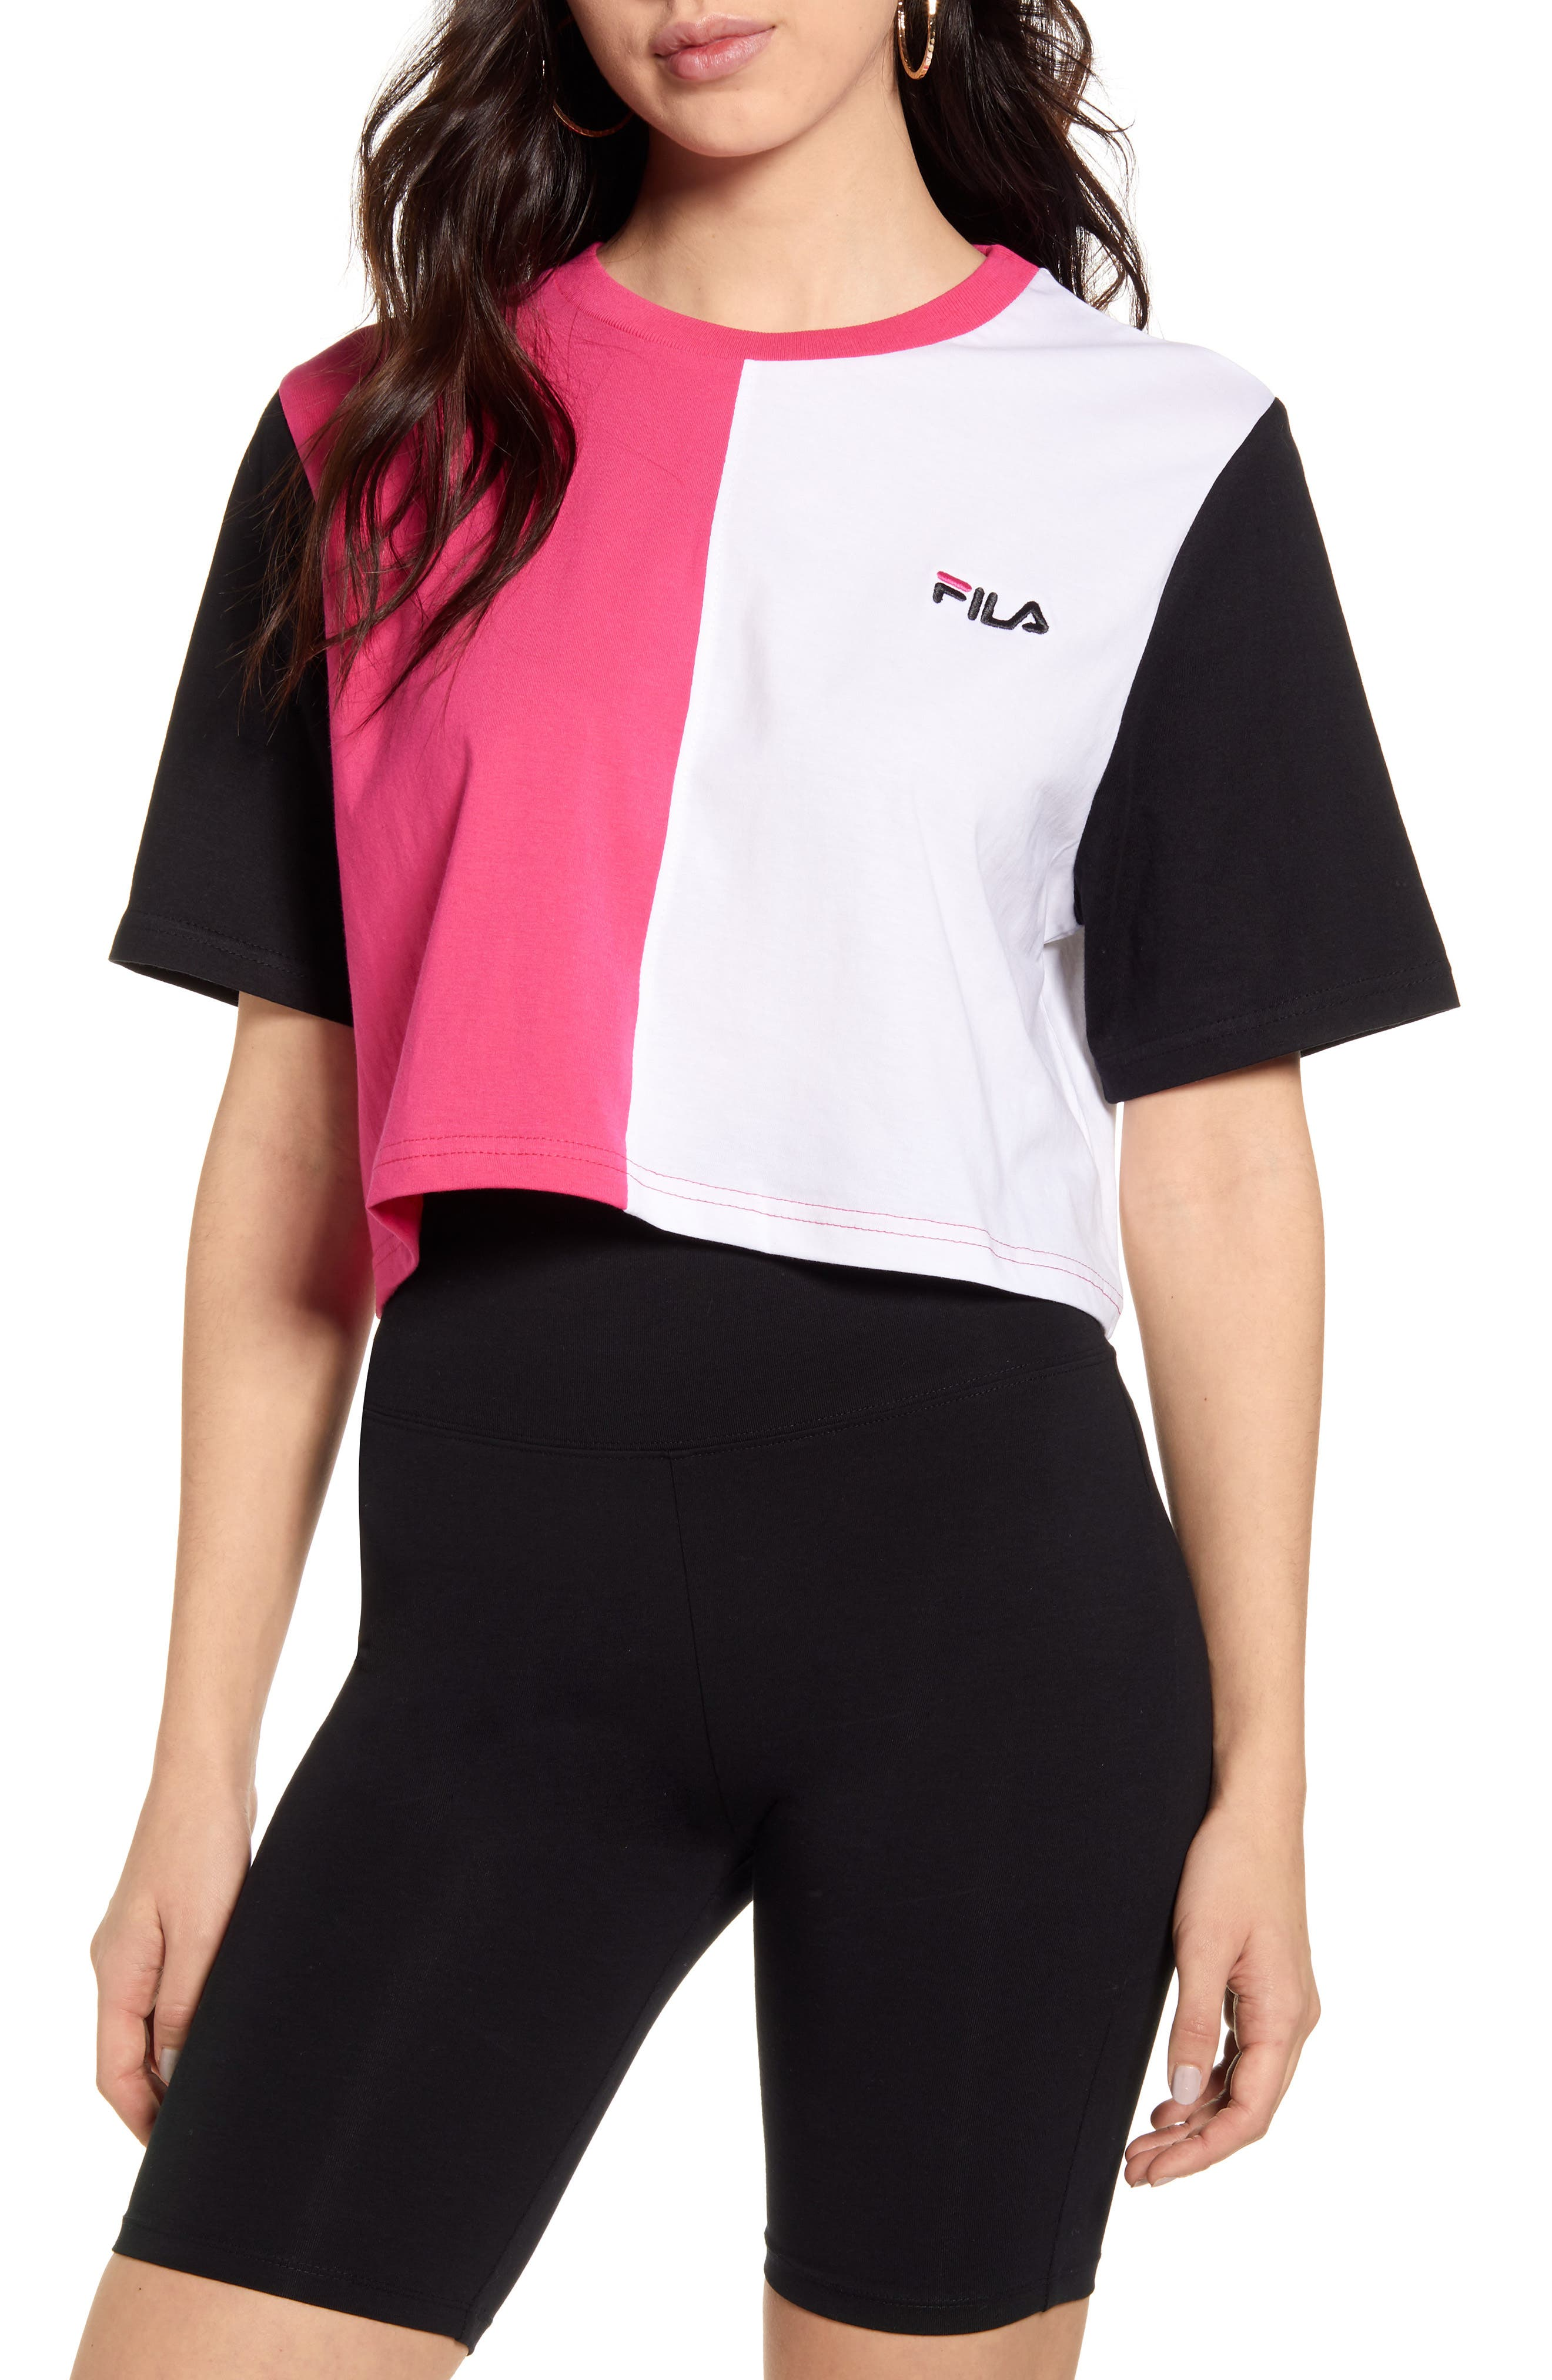 Women's FILA Clothing   Nordstrom